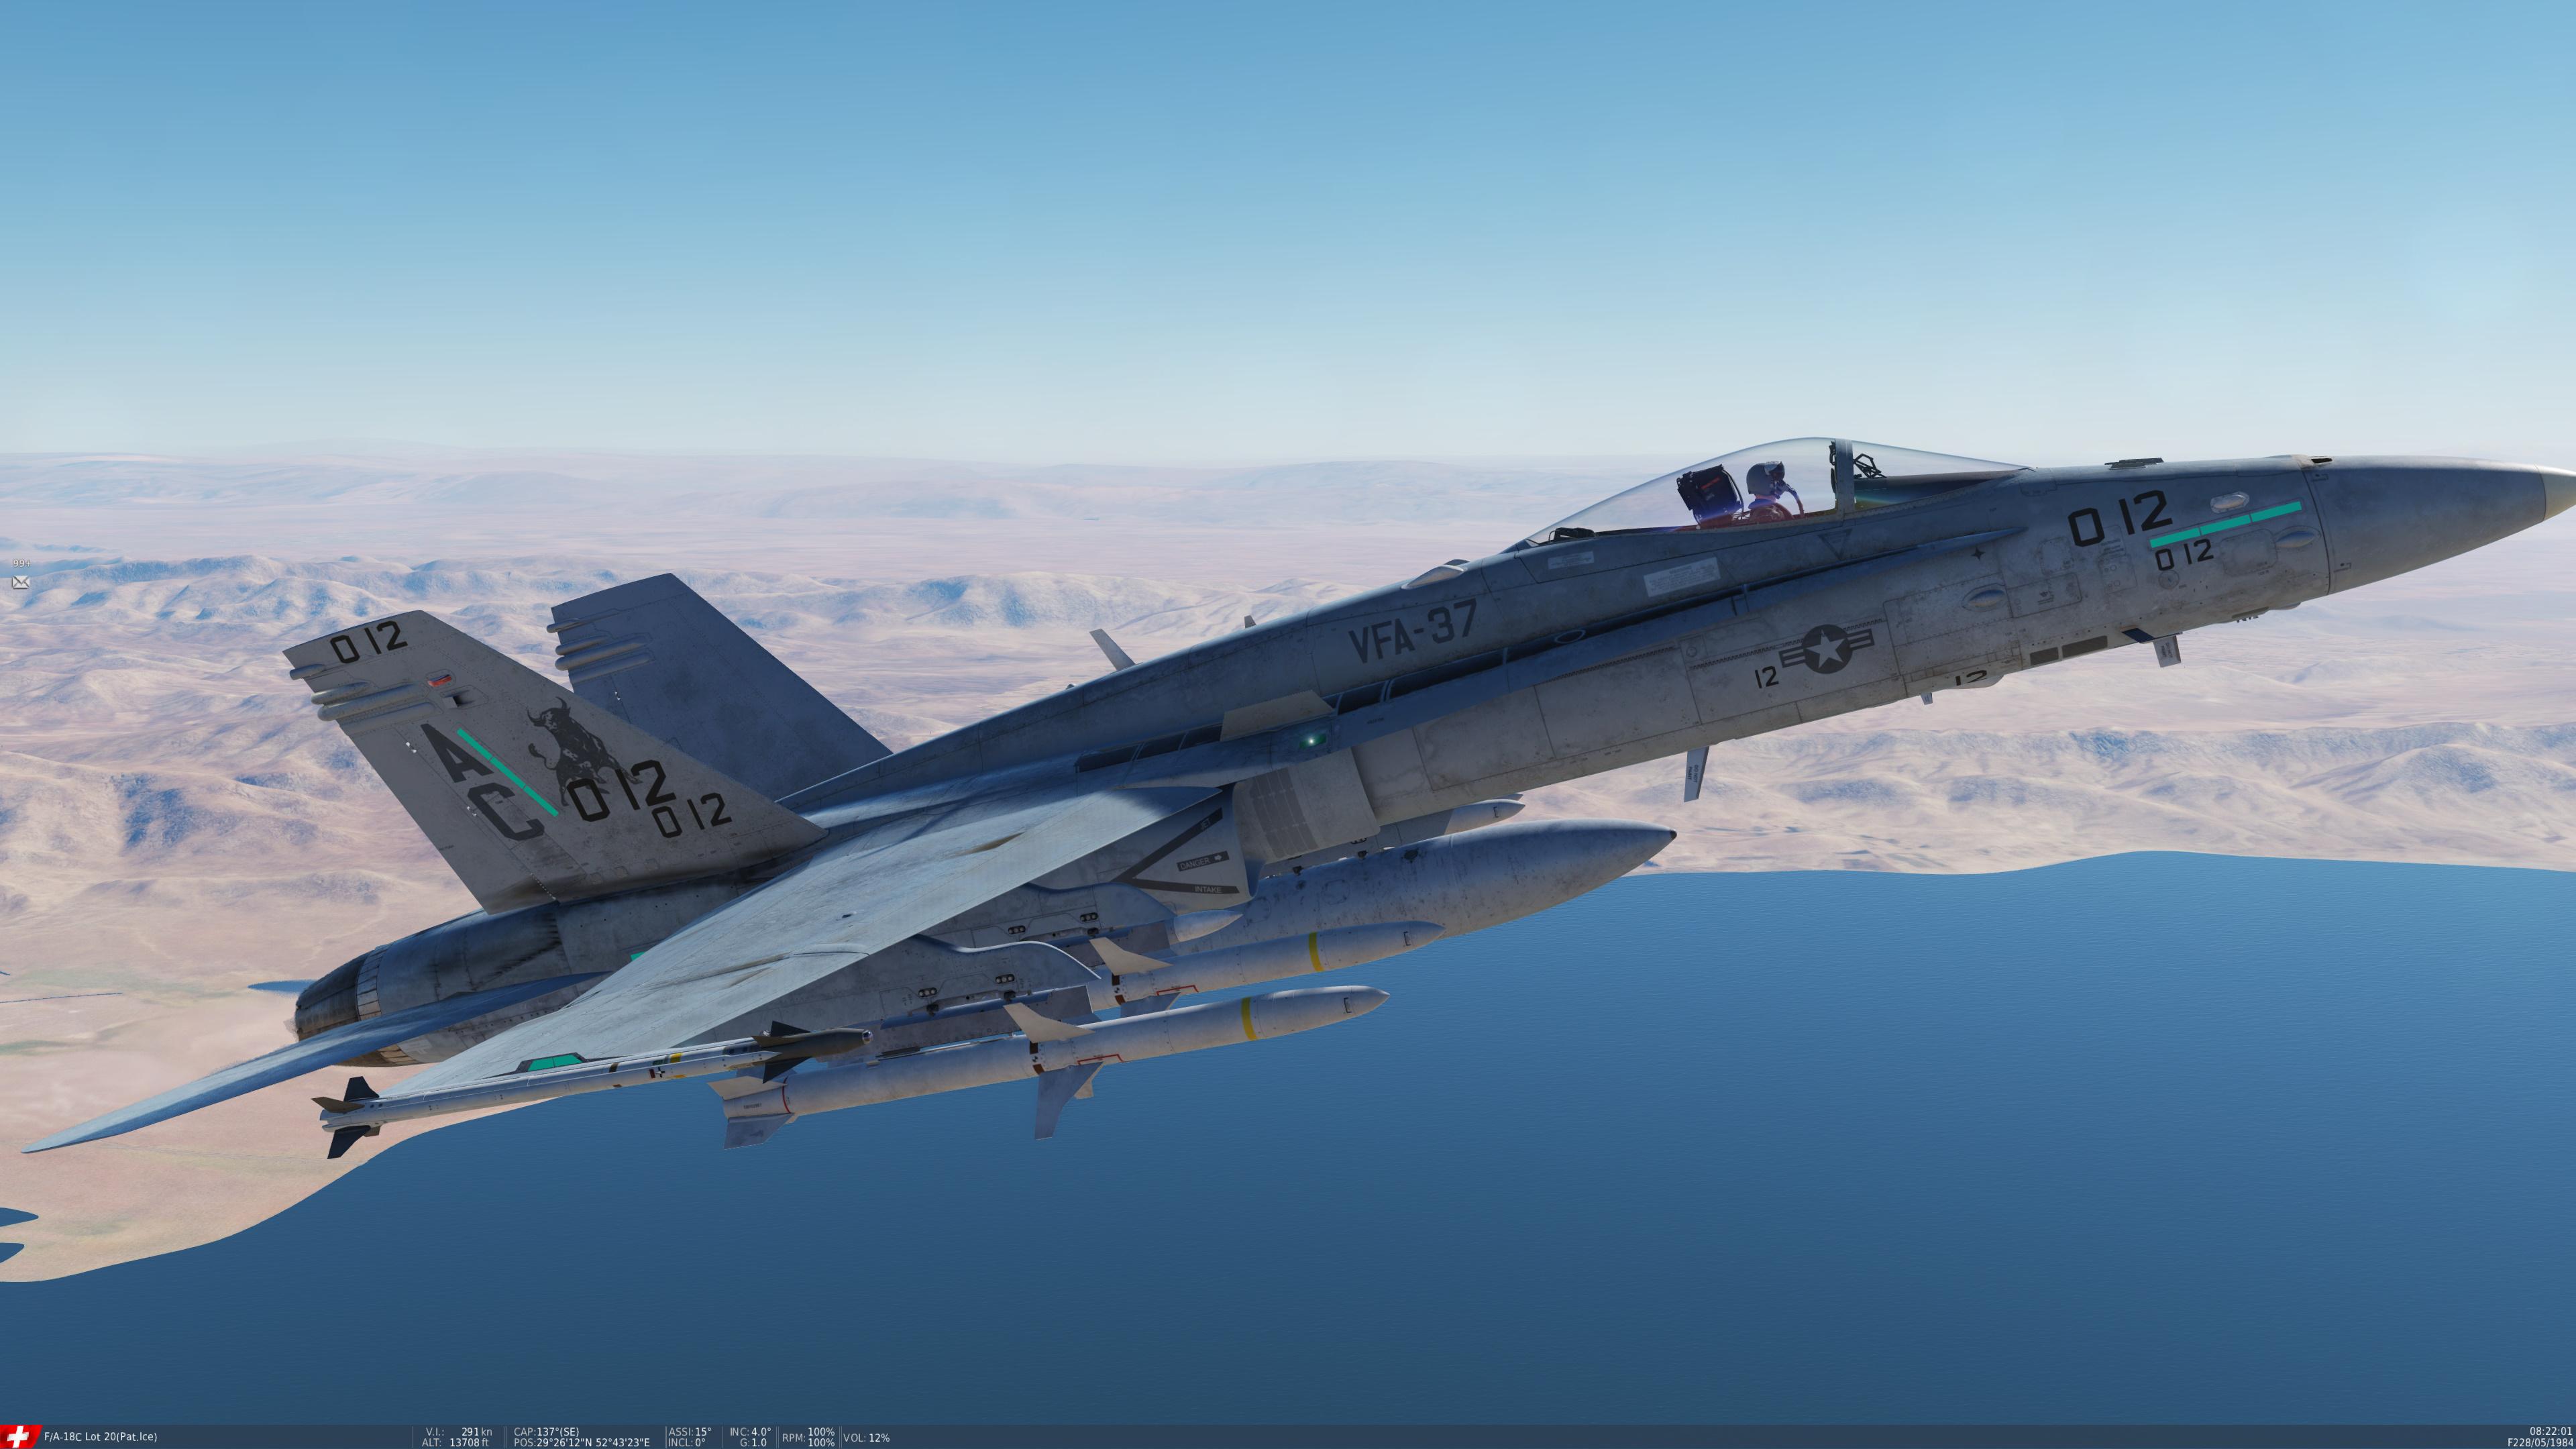 [Cursus UH-1H Huey] Photos de nos missions Bandicam_2021-01-26_22-28-52-468